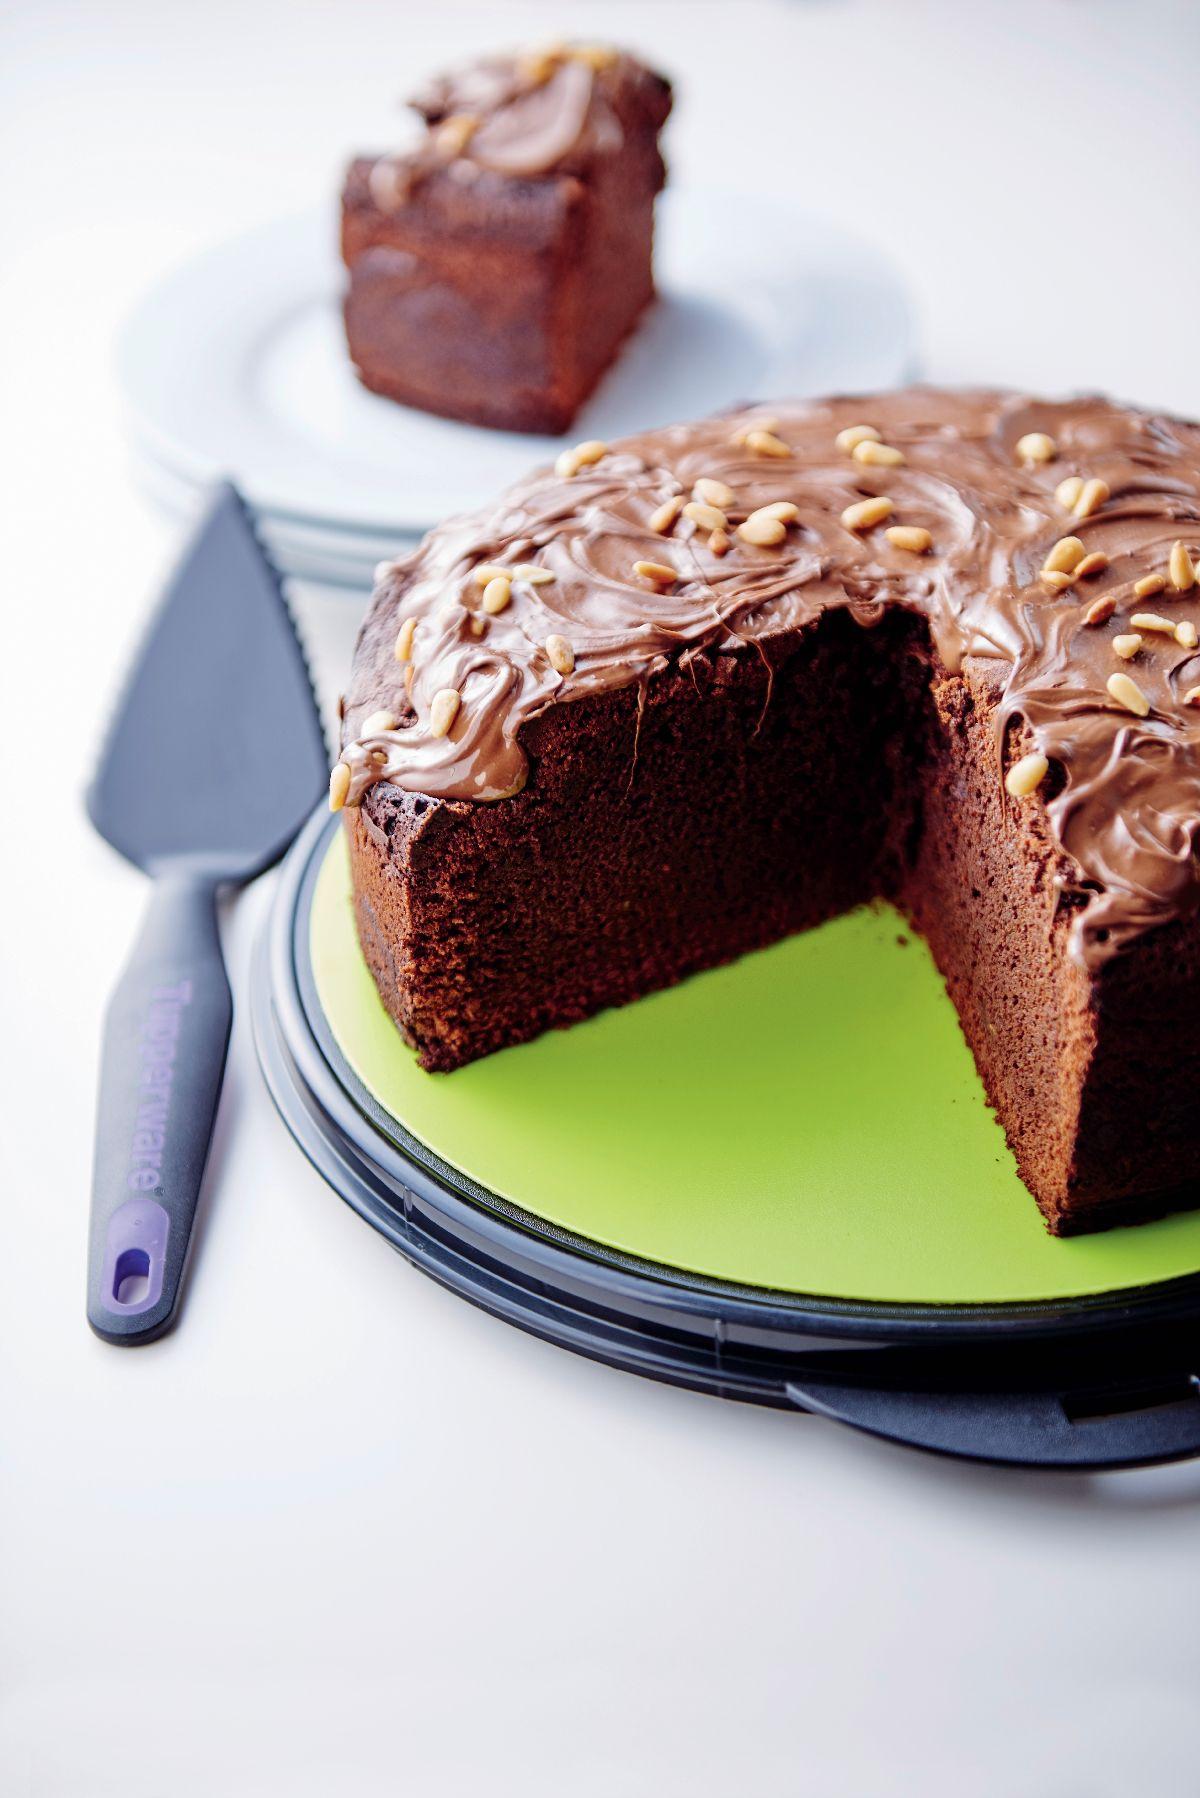 Chocolate cake for dessert yes please tupperware